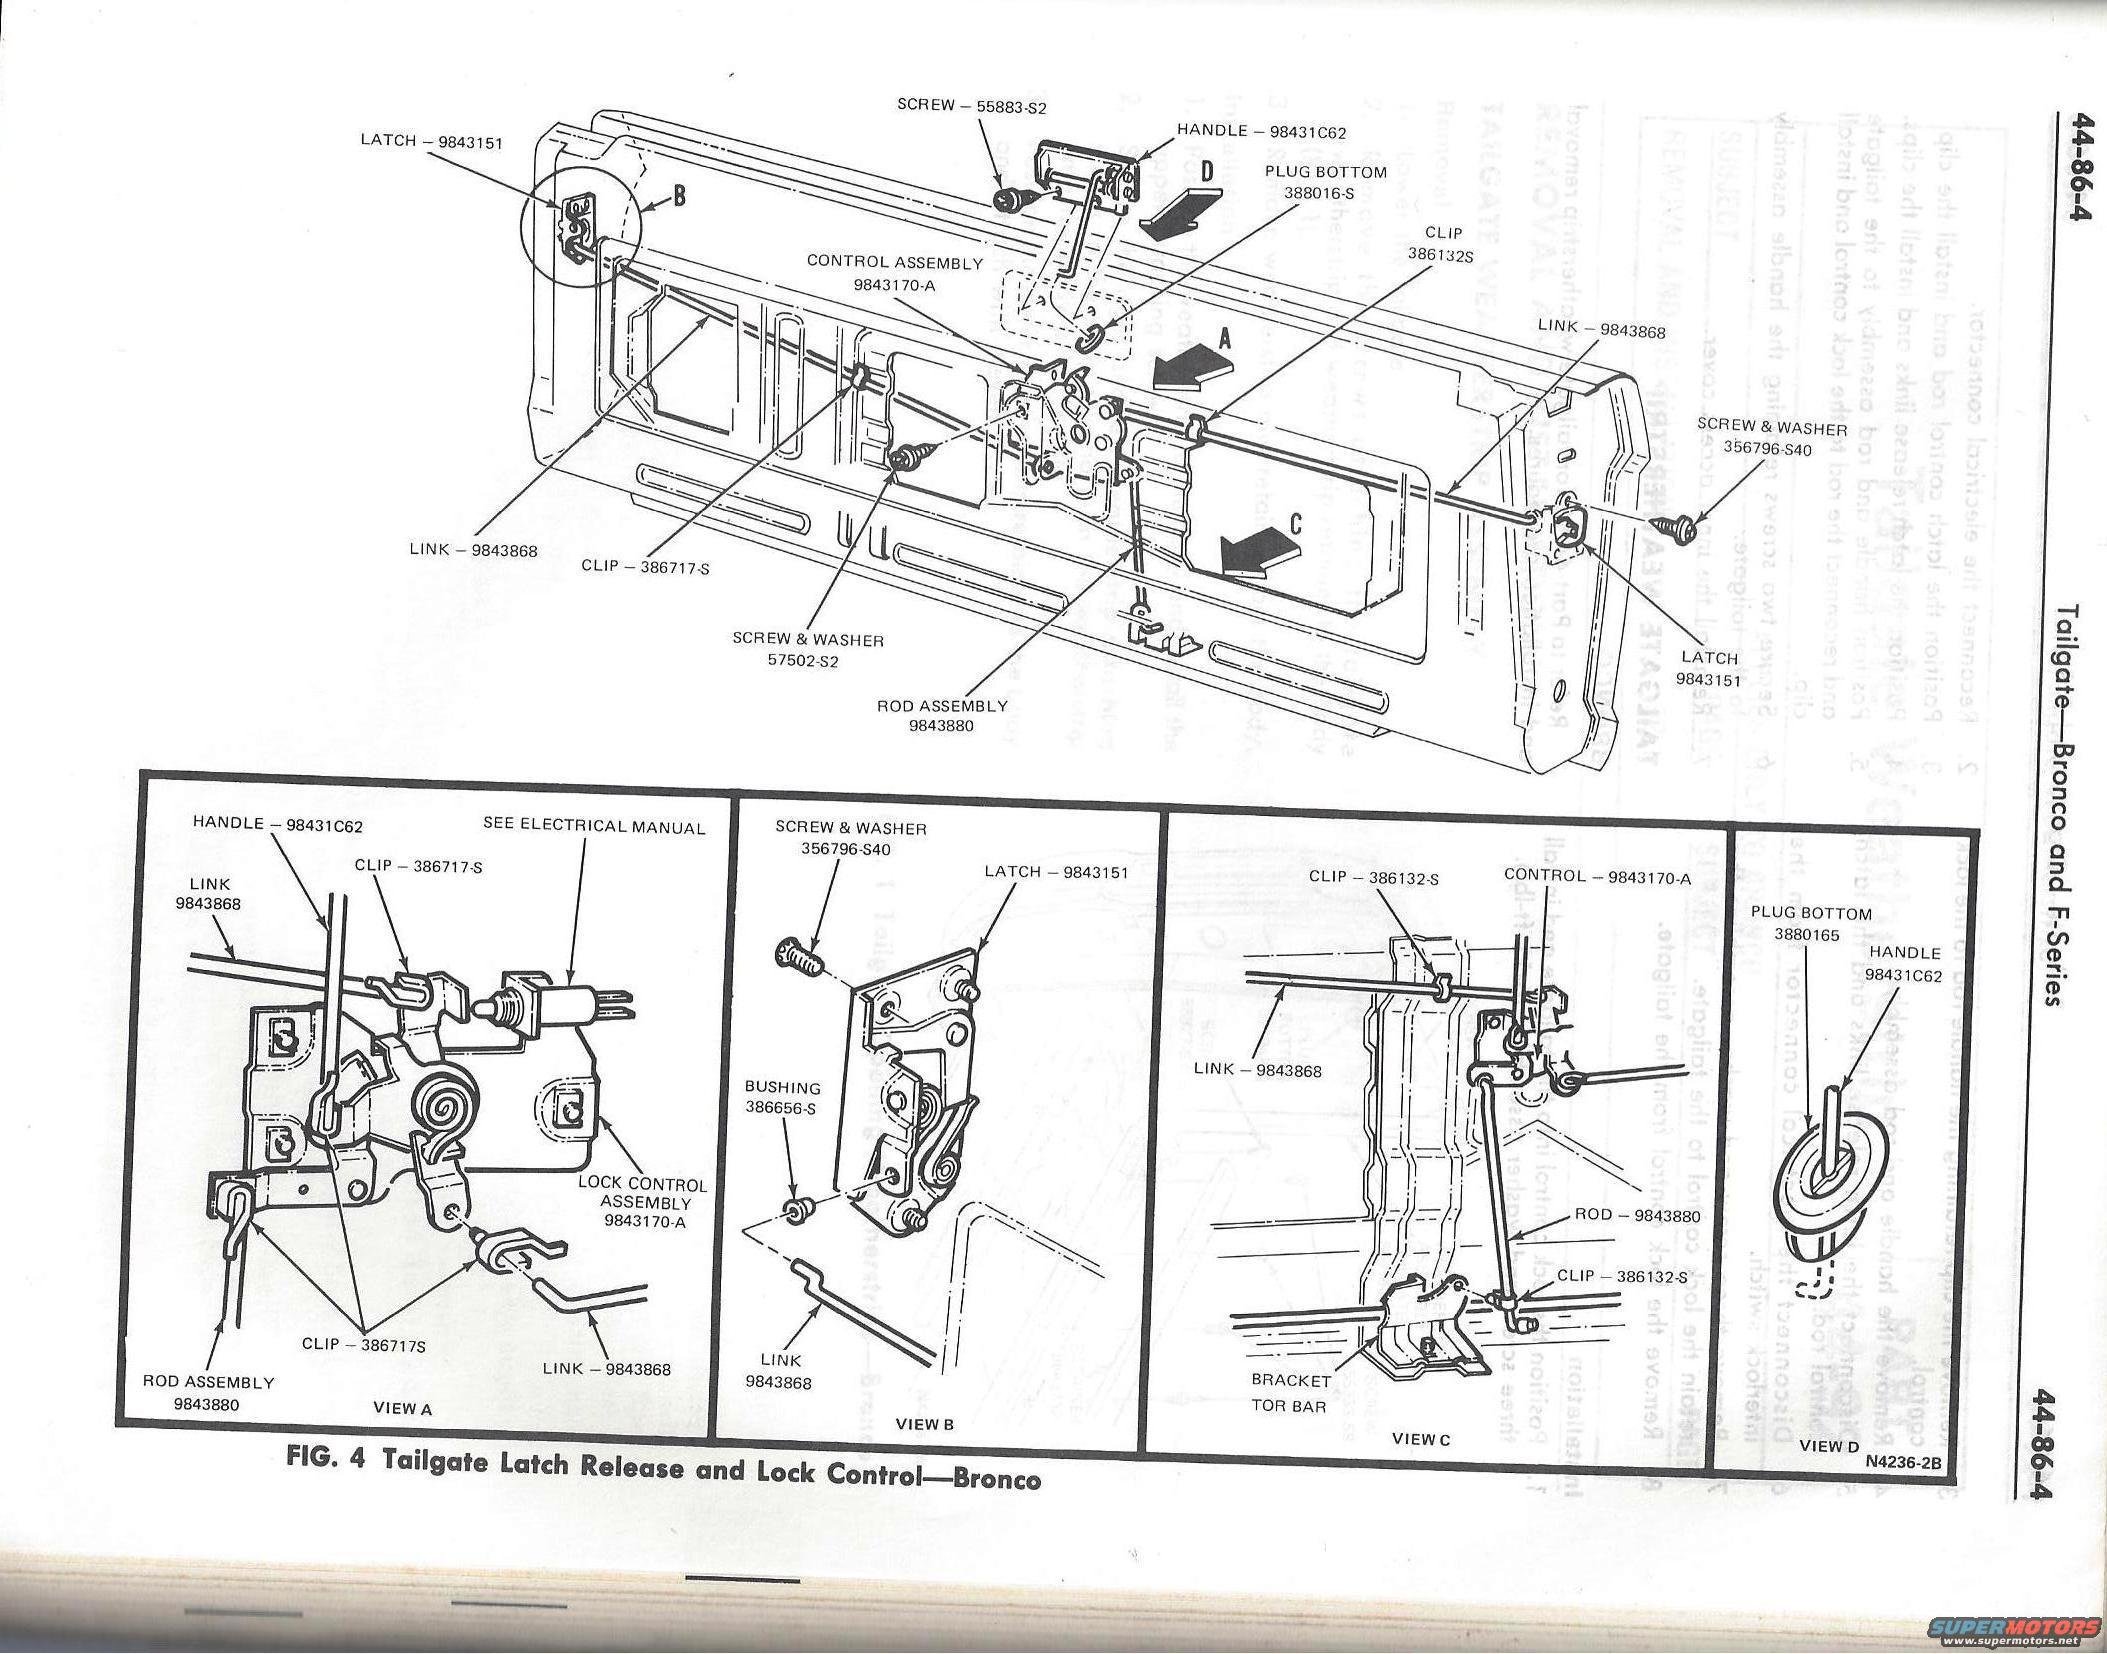 Tailgate Service Manual Pics